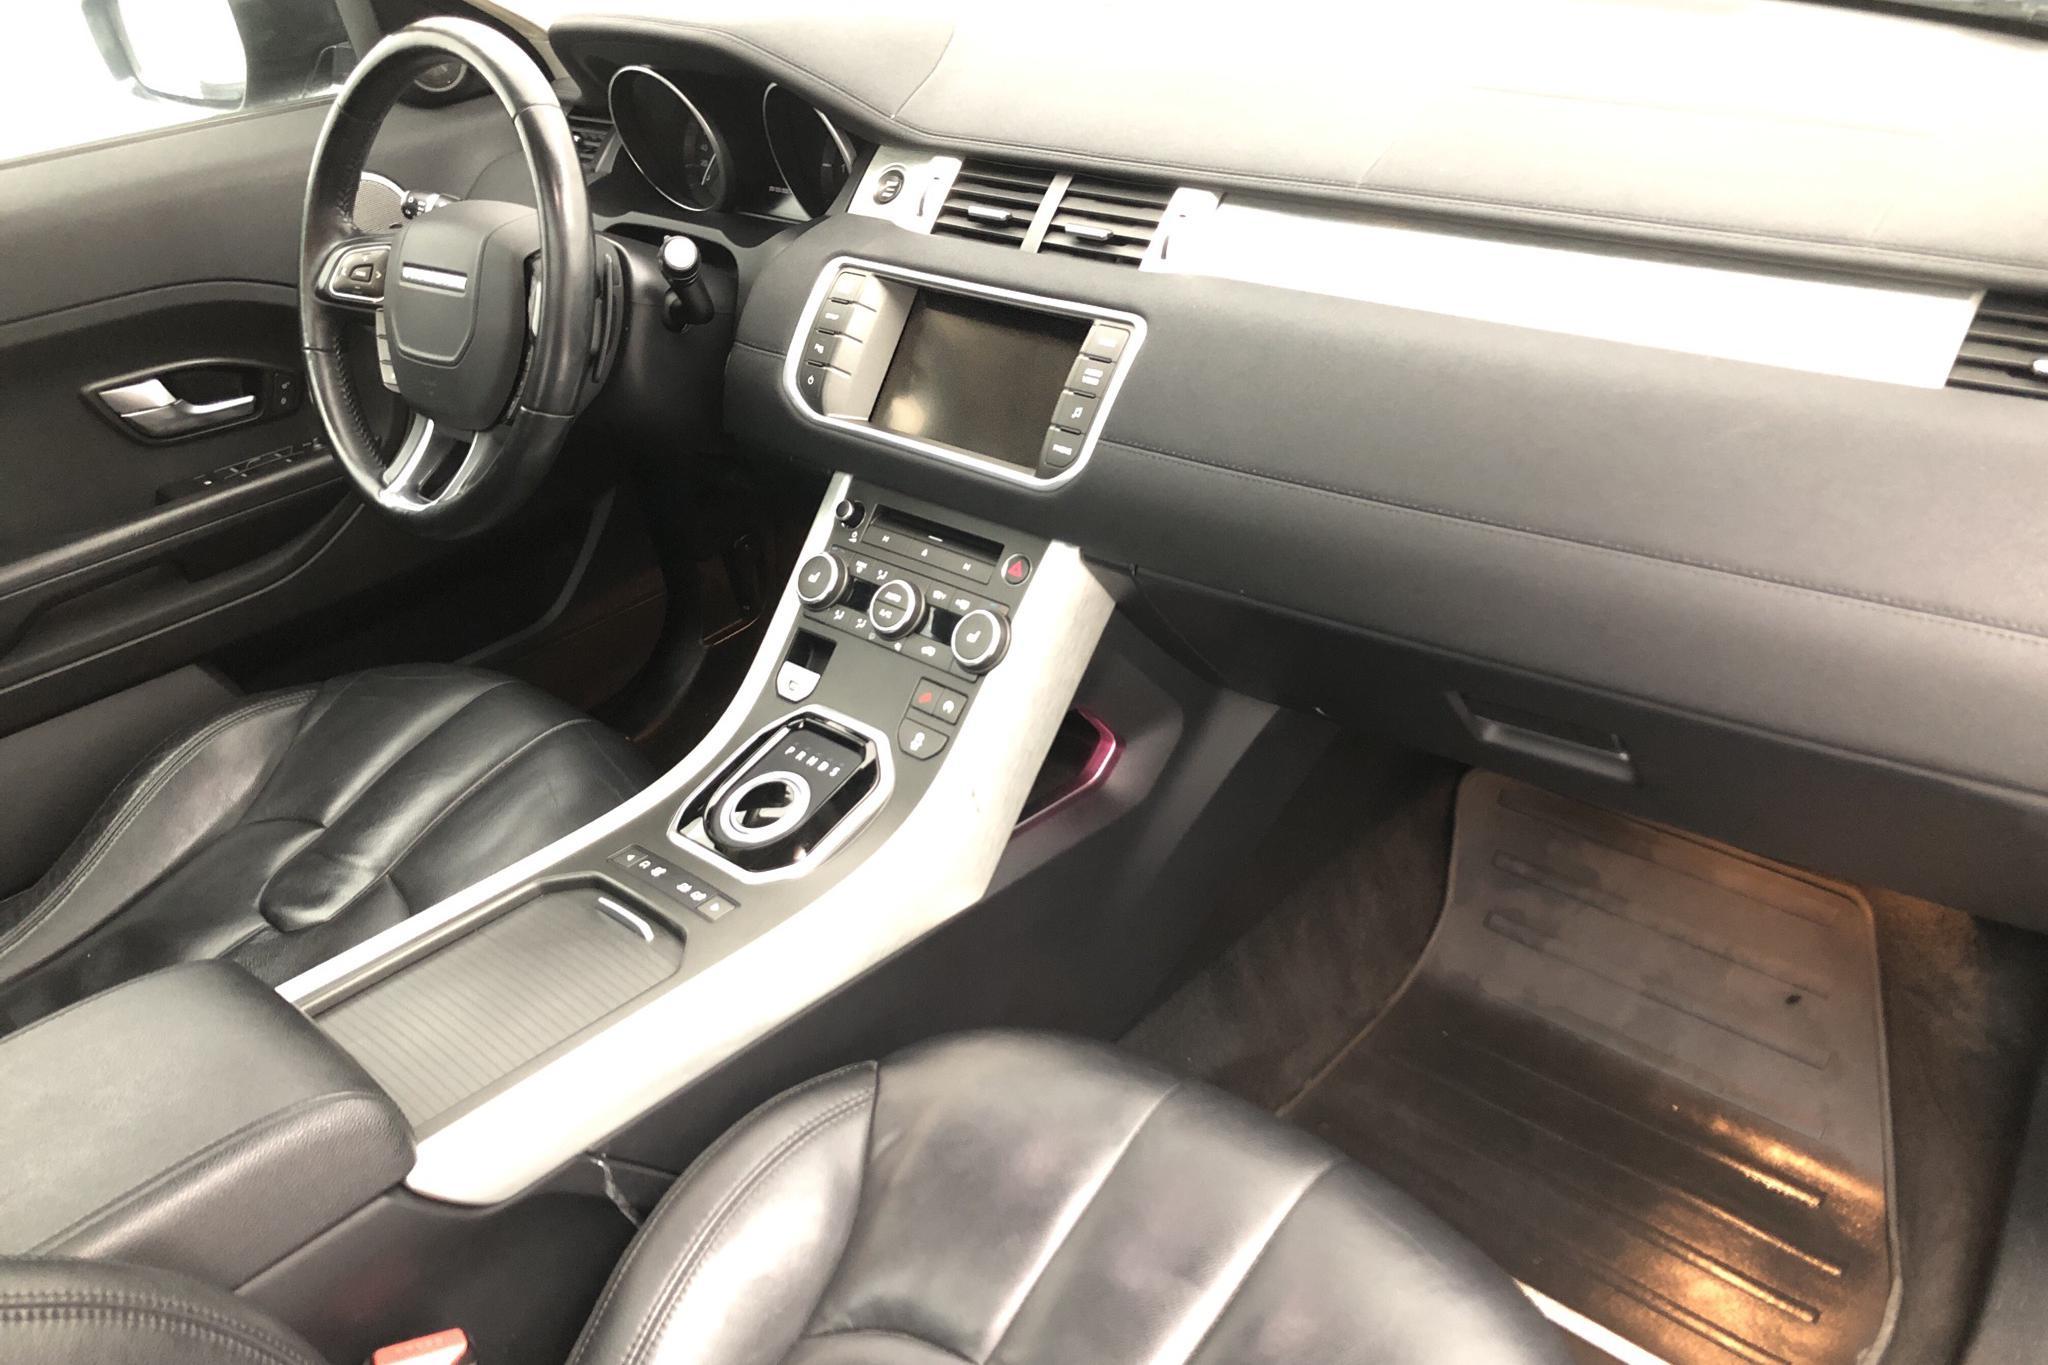 Land Rover Range Rover Evoque 2.2 SD4 5dr (190hk) - 15 734 mil - Automat - svart - 2014